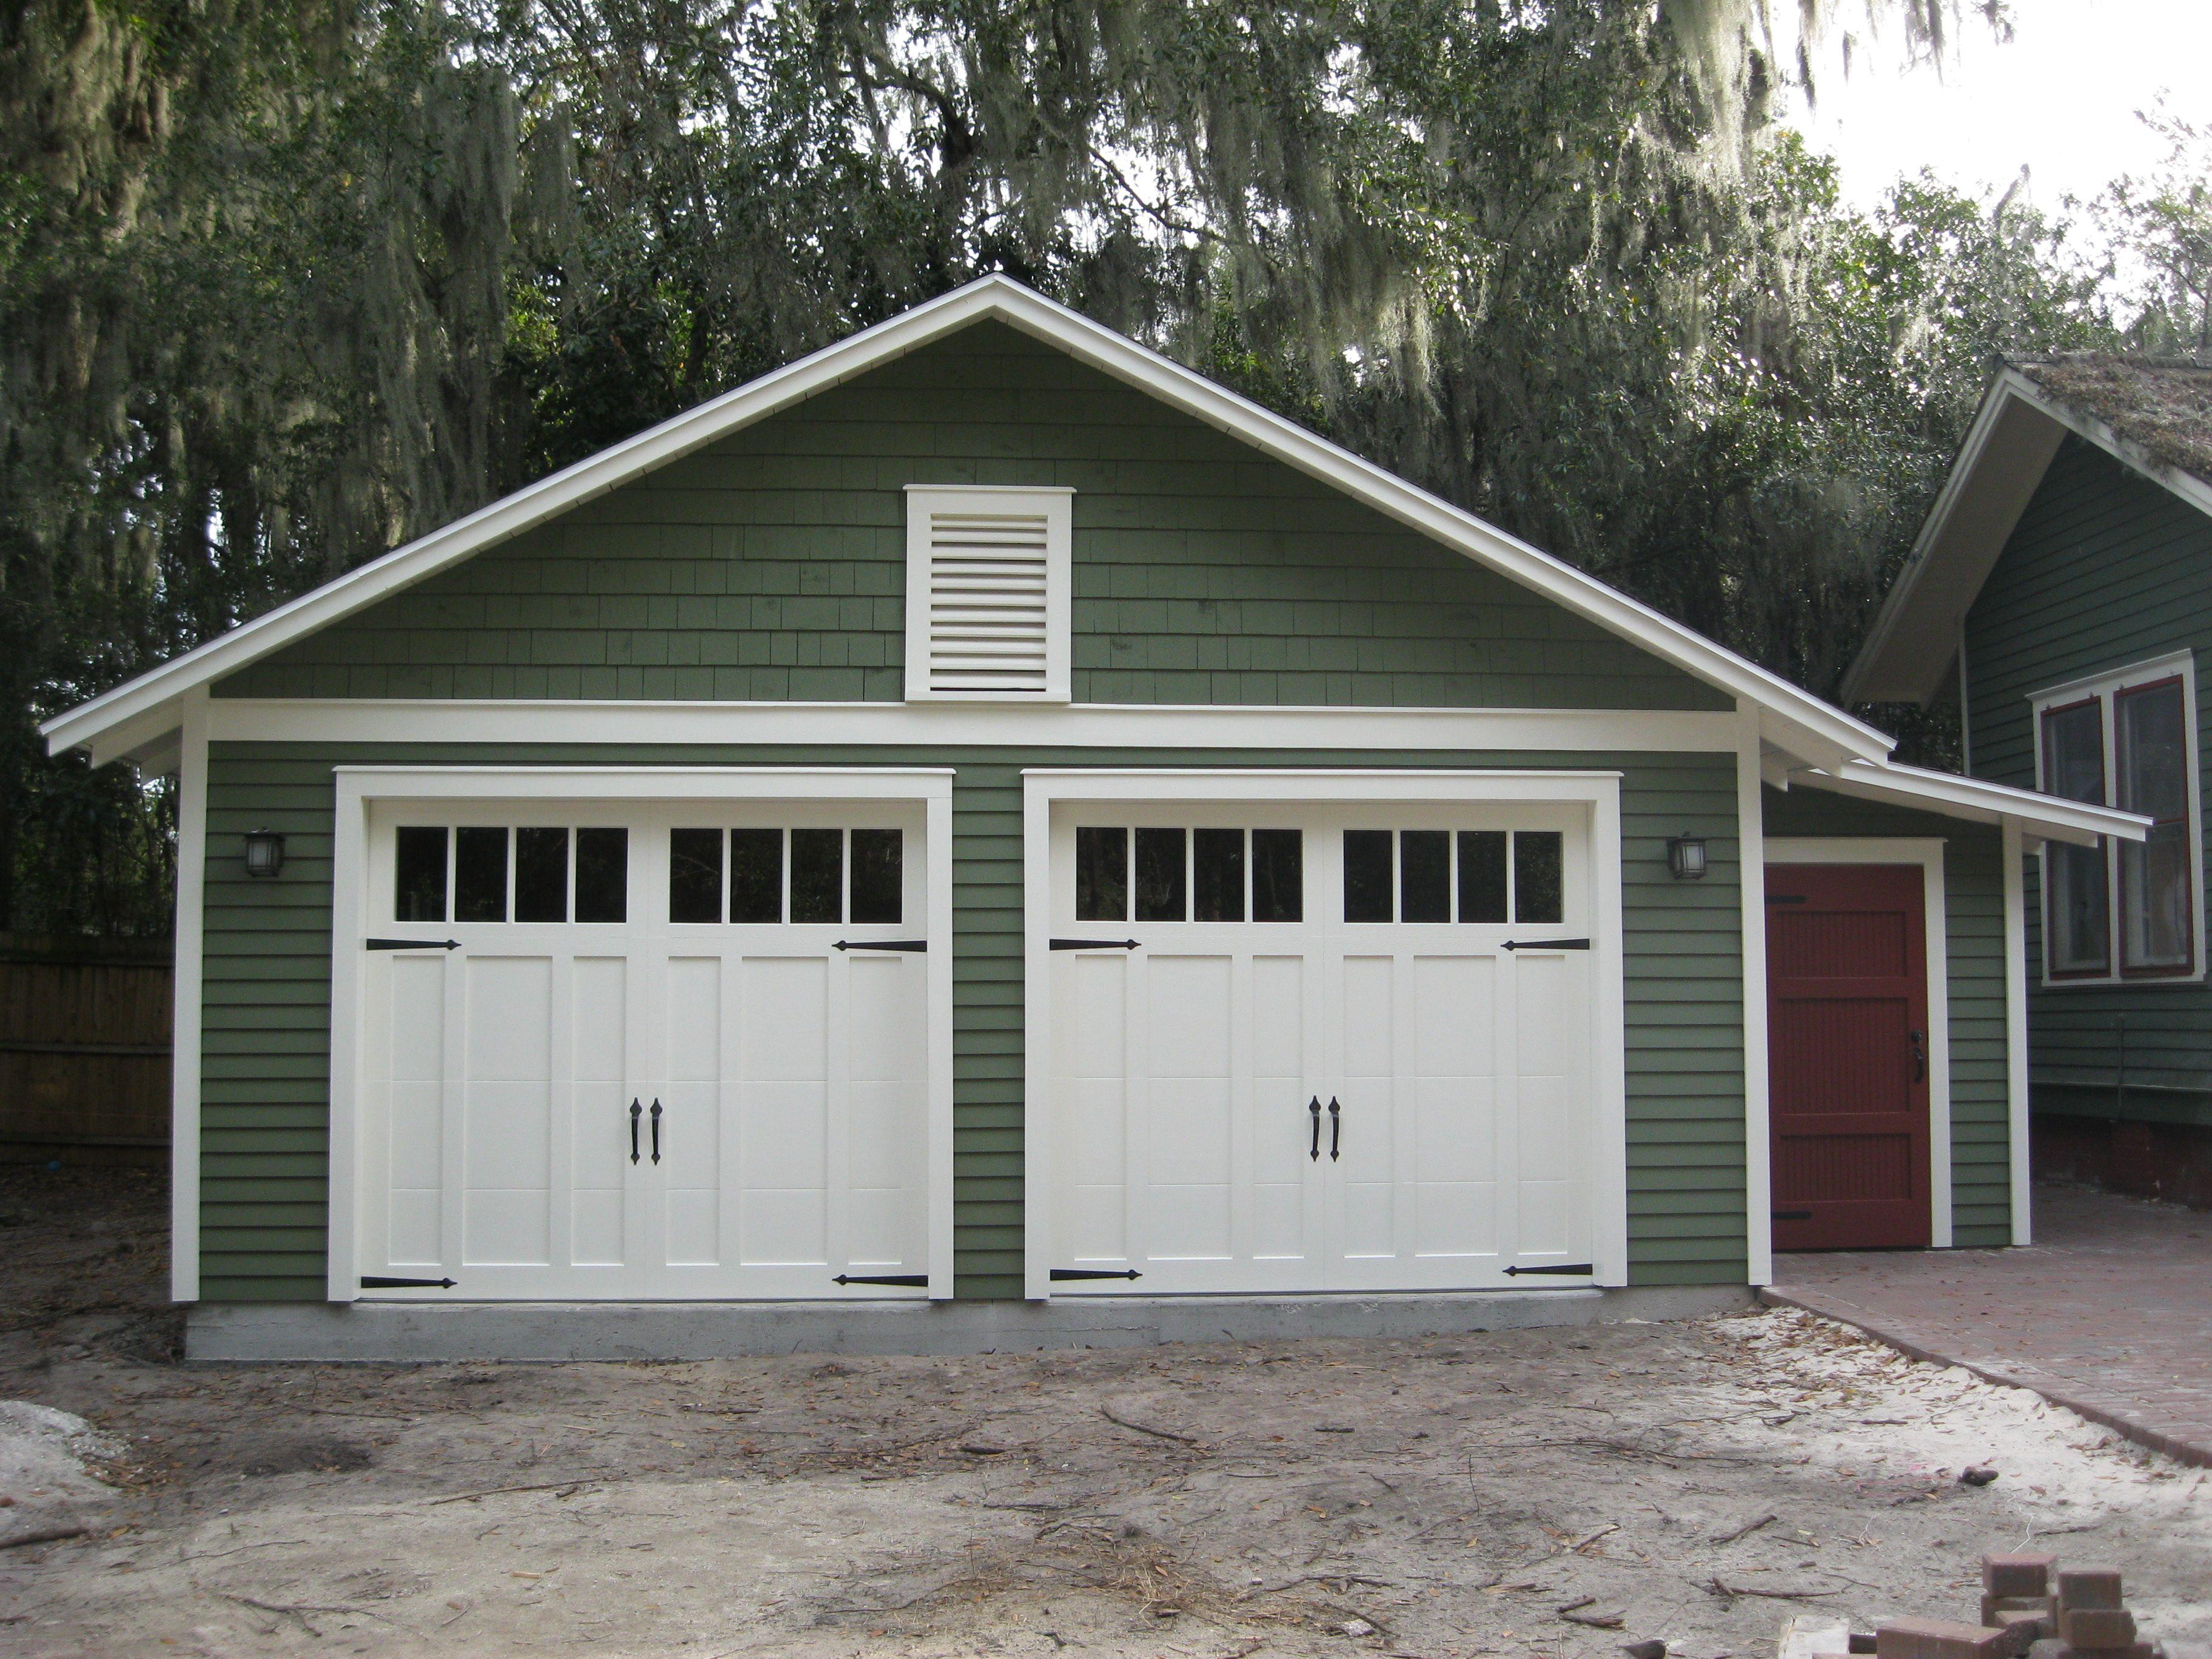 Detached Two Car Bungalow Garage In Gainesville Fl Detached Garage Designs Garage Plans Detached Garage Design